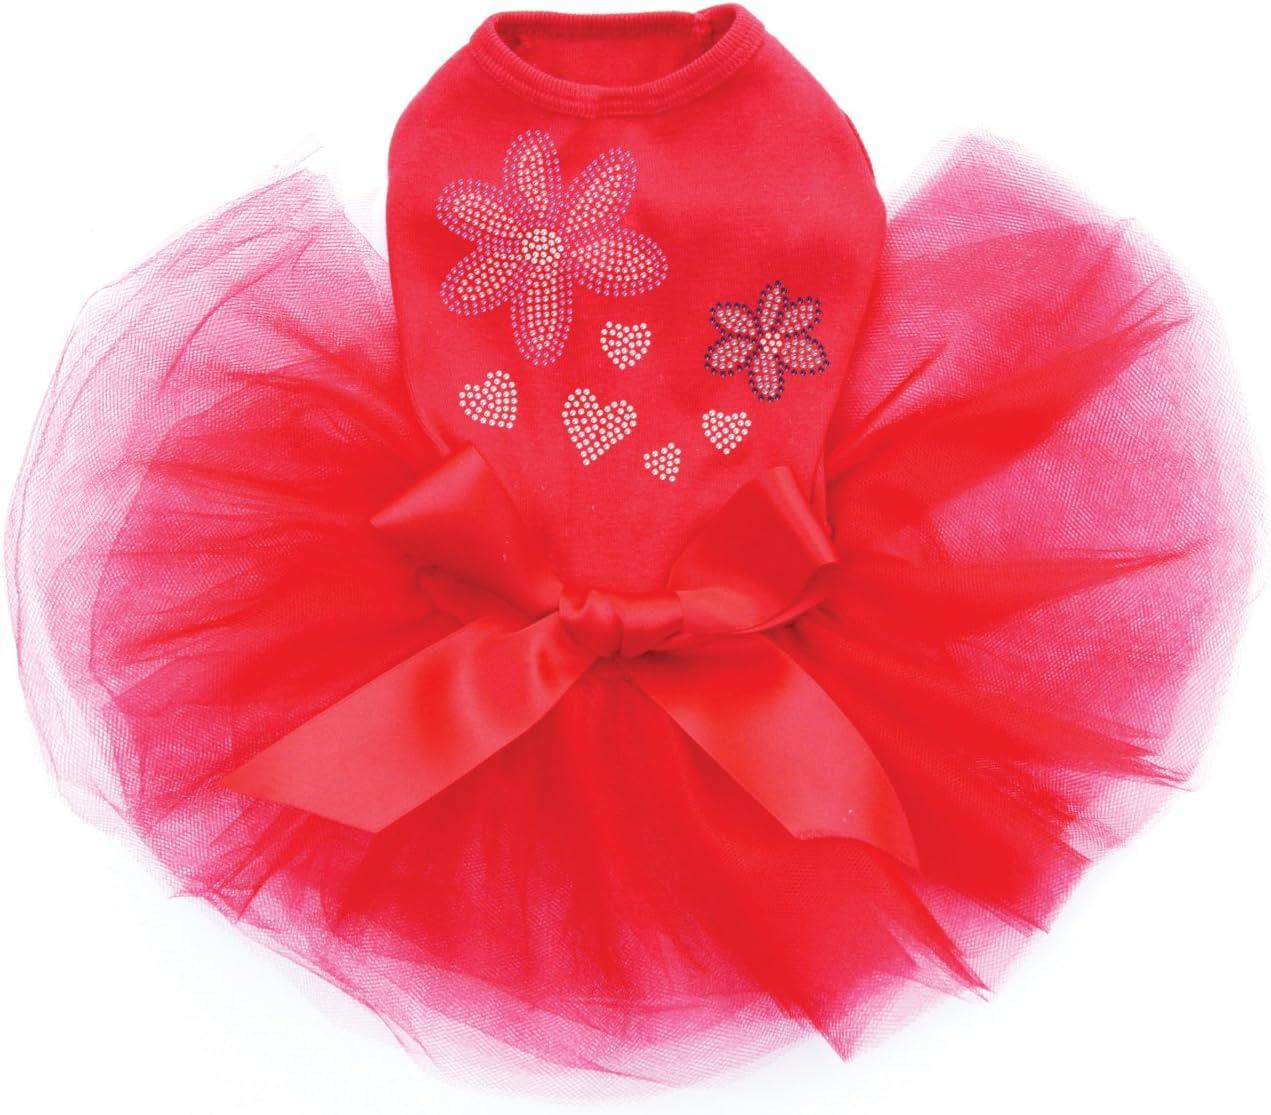 Pink Purple Flowers - Bling Rhinestone 3XL Max 74% OFF Large-scale sale Dog Dress Red Tutu